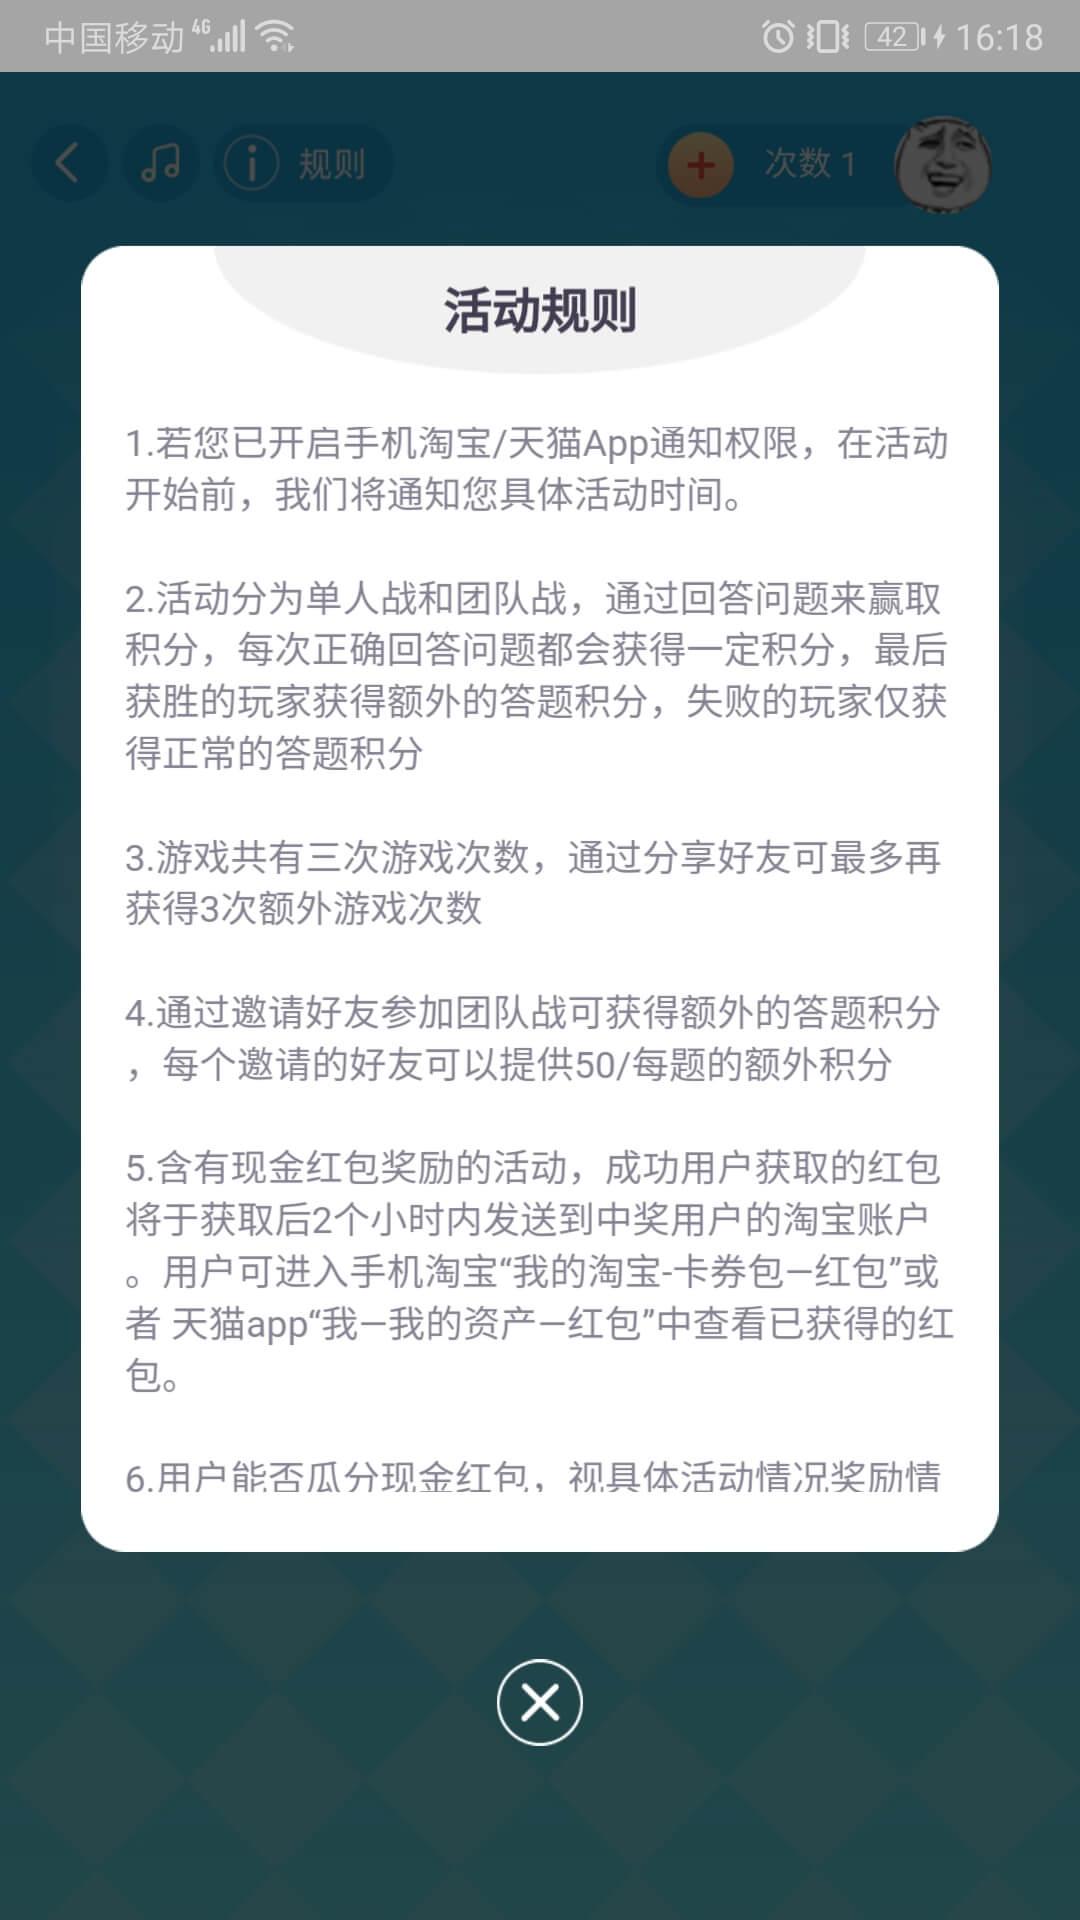 Screenshot_20190814_161823_com.taobao.taobao.jpg